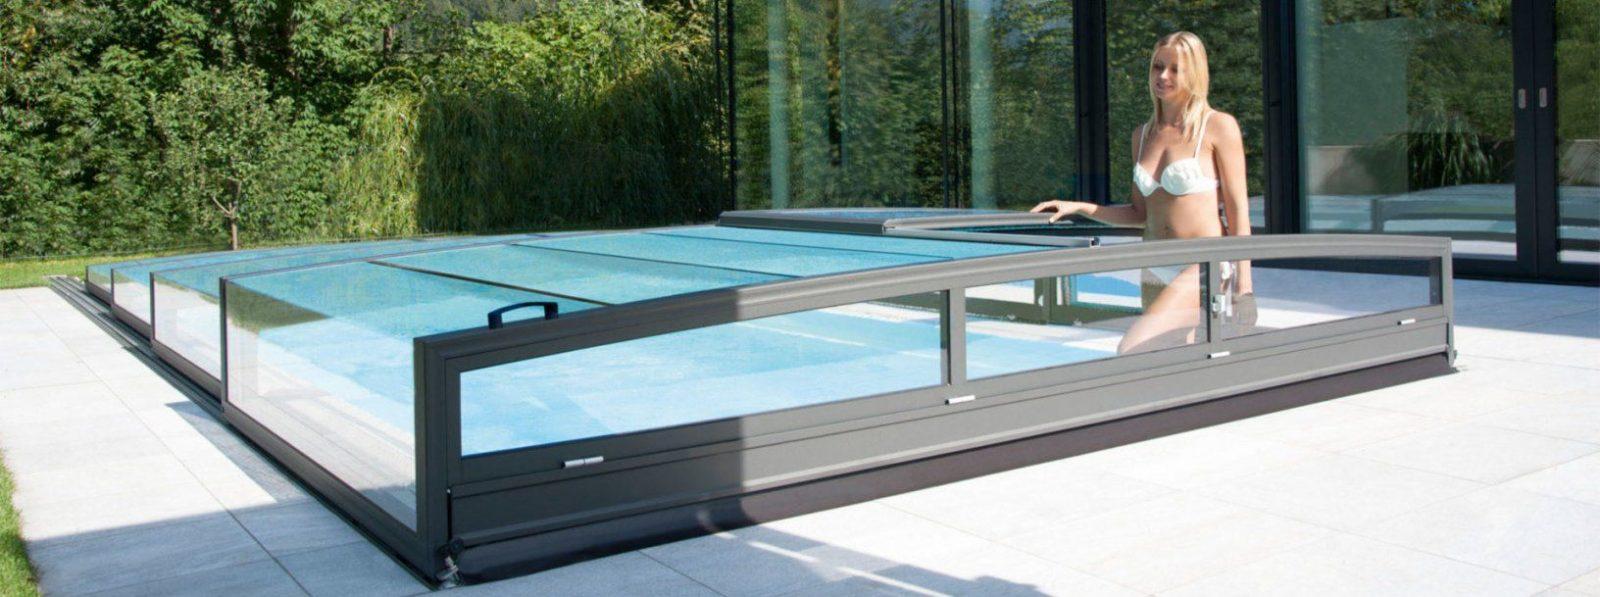 Pool Rollo Selber Bauen Perfect Poolplane Solarfolie Solarplane von Pool Rollo Selber Bauen Photo